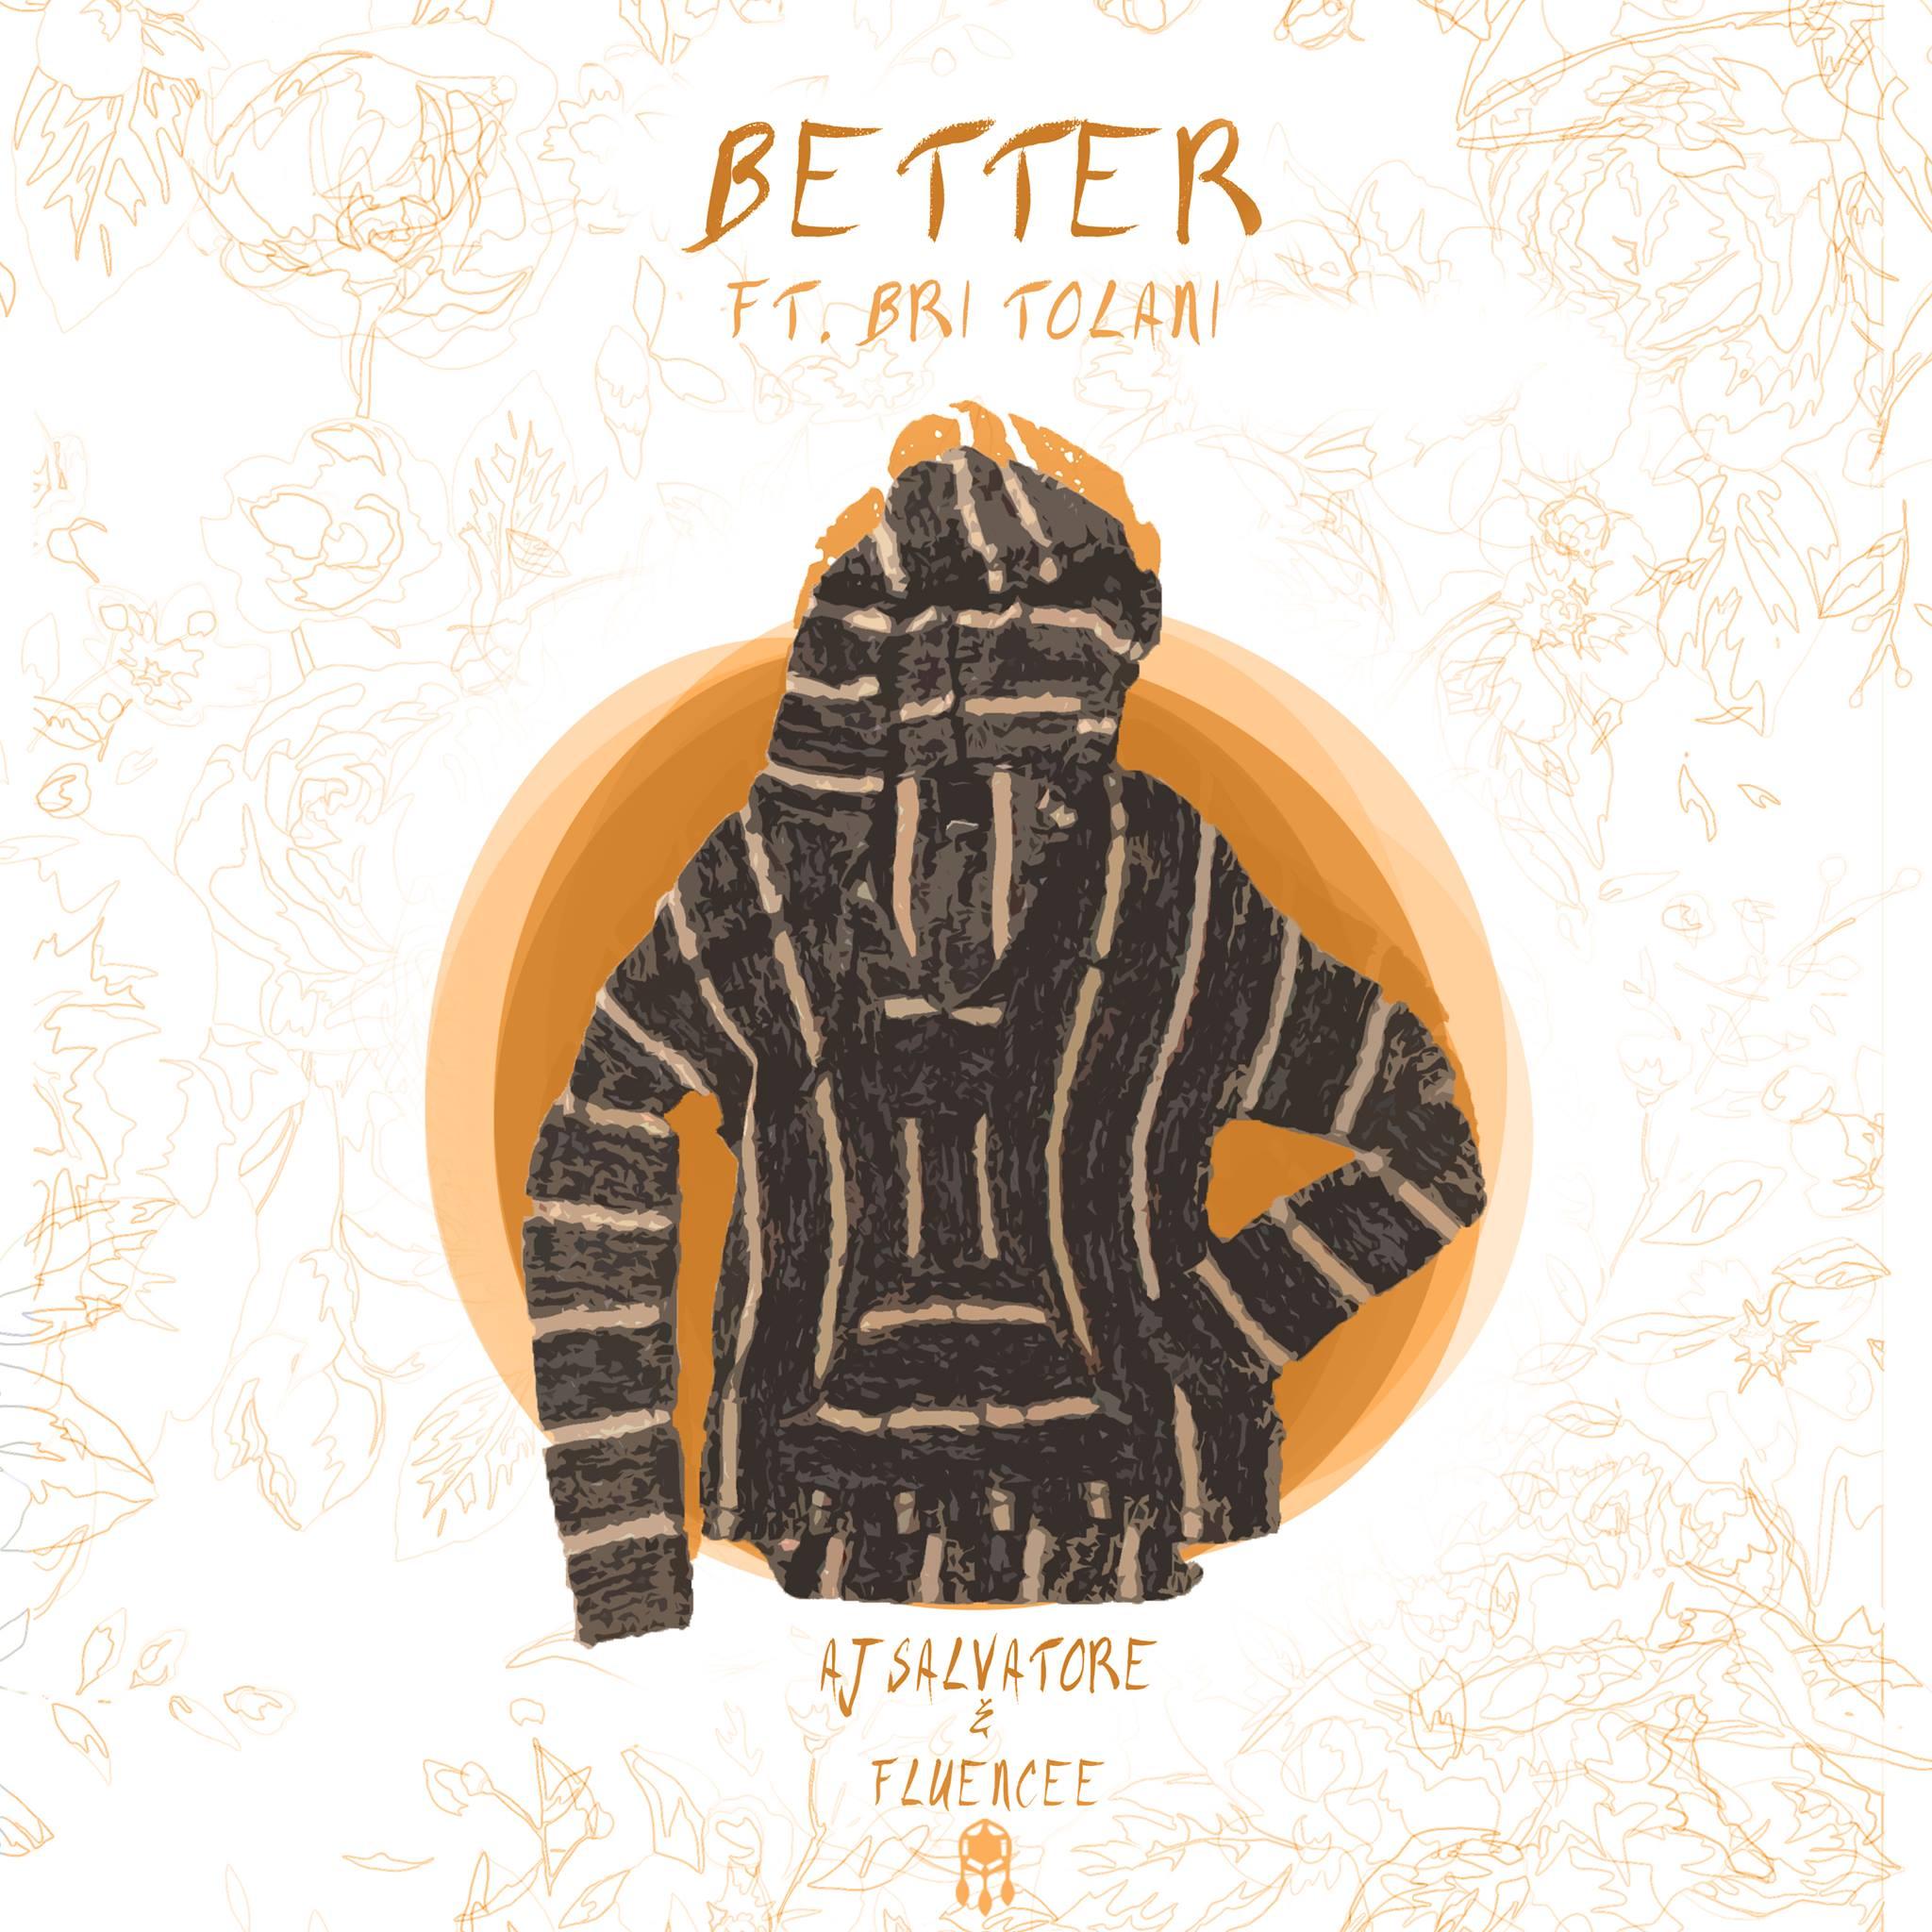 AJ Salvatore & Fluencee – Better ft. Bri Tolani (Original Mix)20901006 1551652974903518 5424477161173670164 O